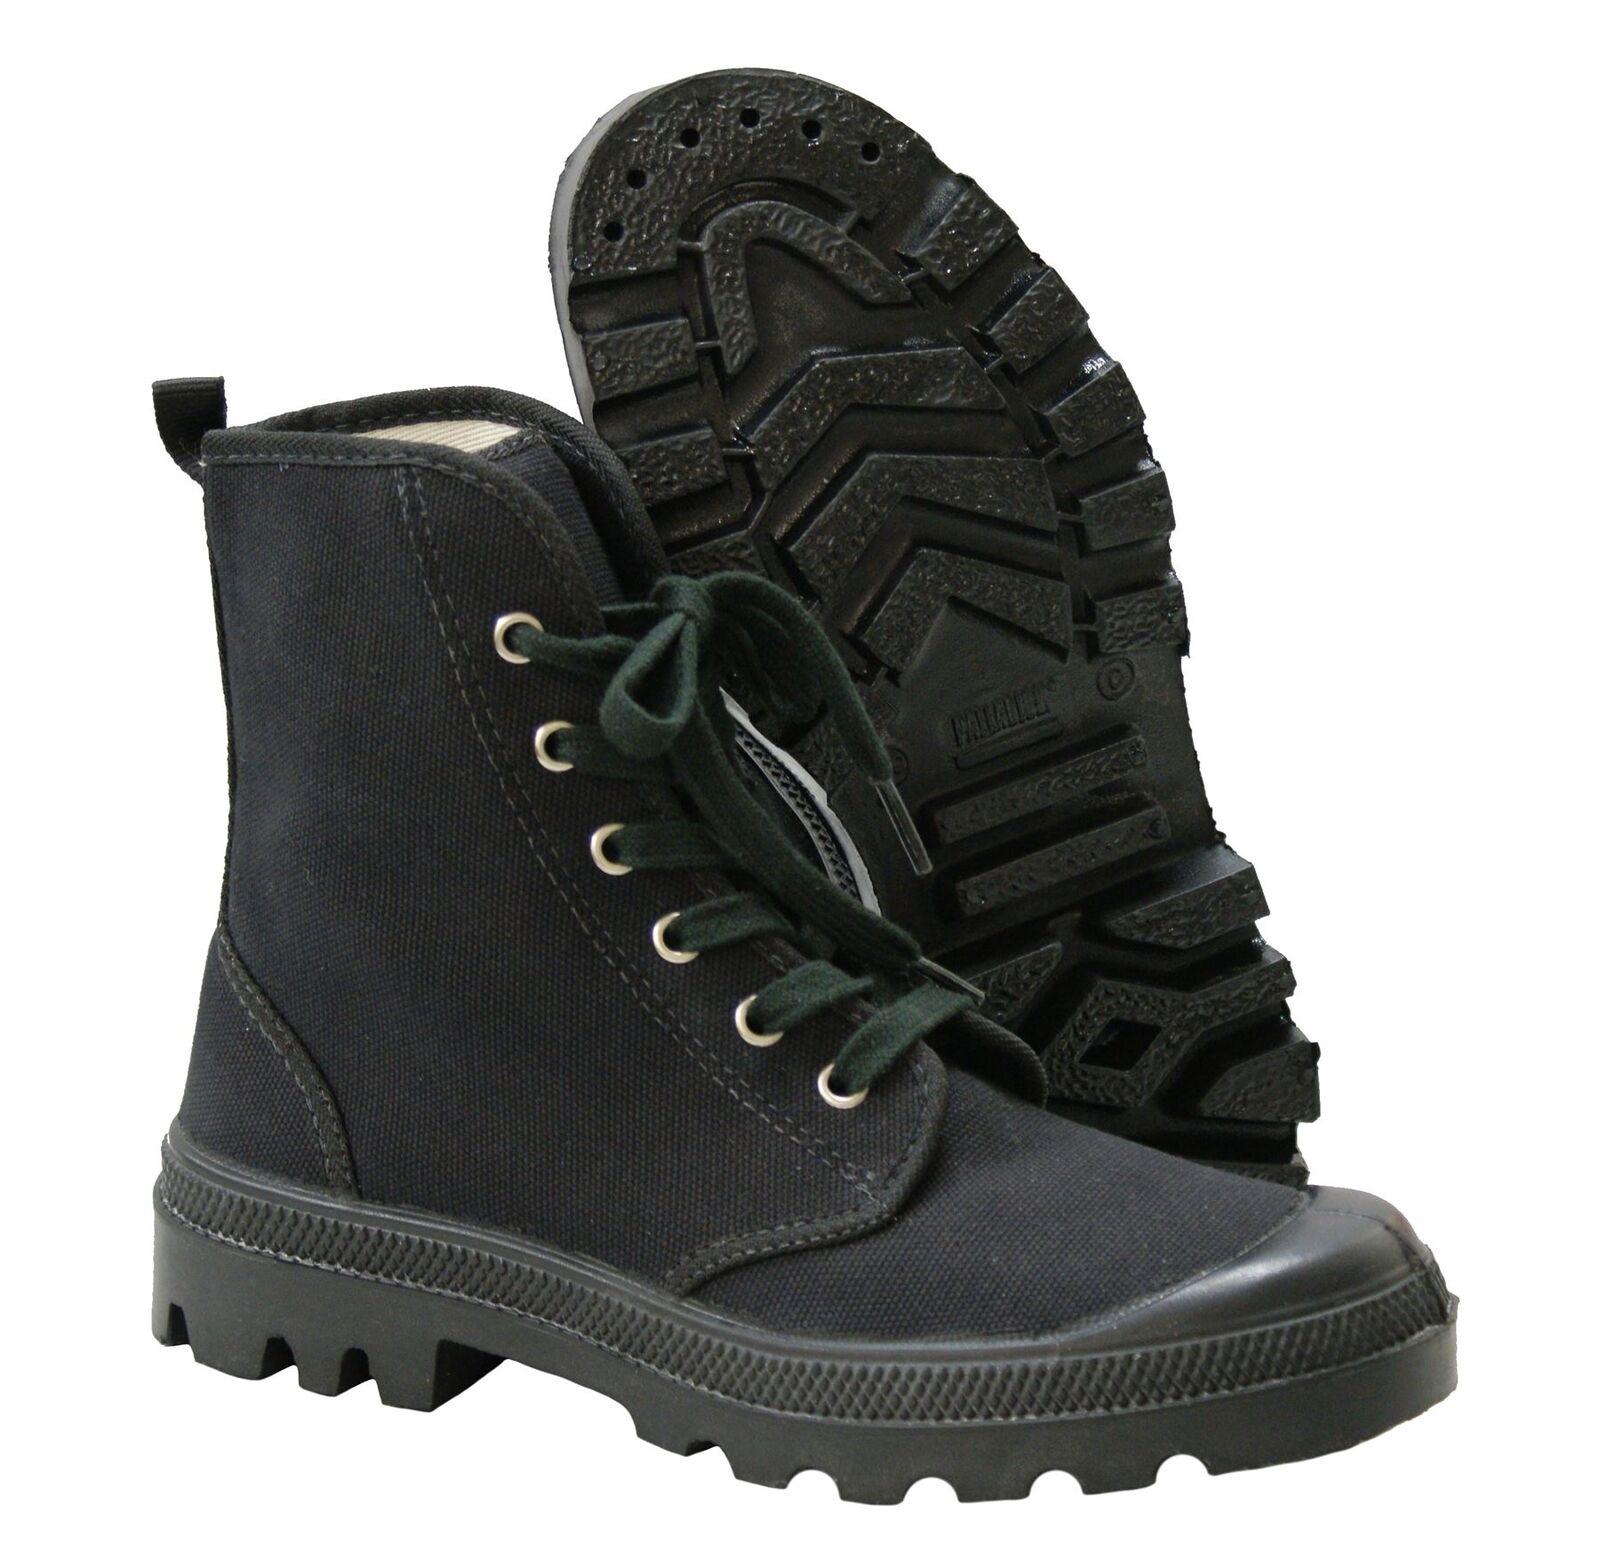 Palladium Style Unisex Footwear Fashionable Hi Top Pampa Canvas Canvas Pampa Stiefel 78a8b1